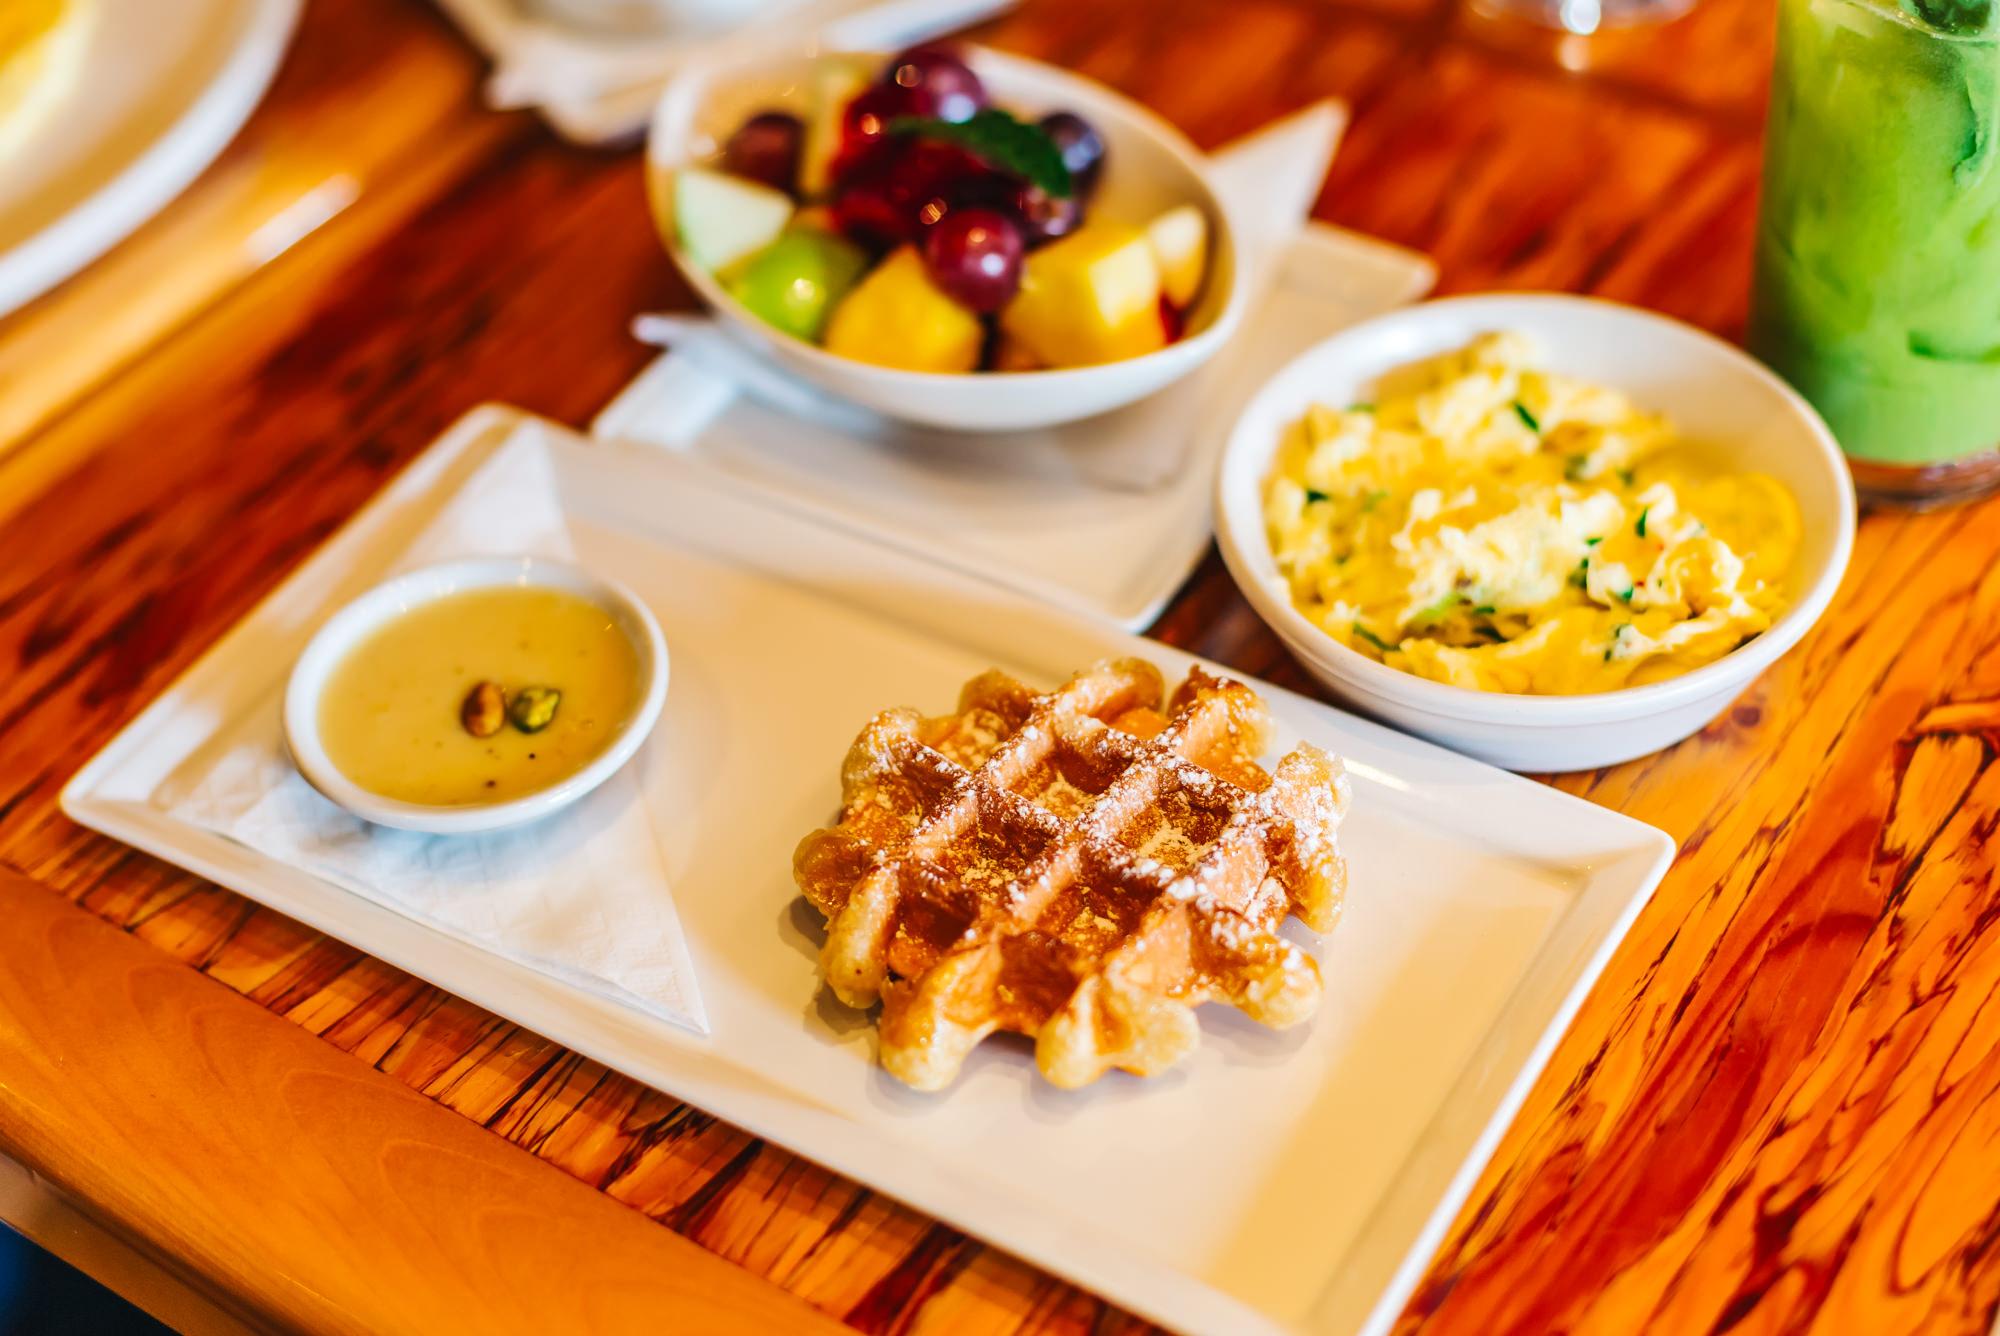 Waffle with White Chocolate Pistachio Rosewater, Free range eggs and Fresh fruit